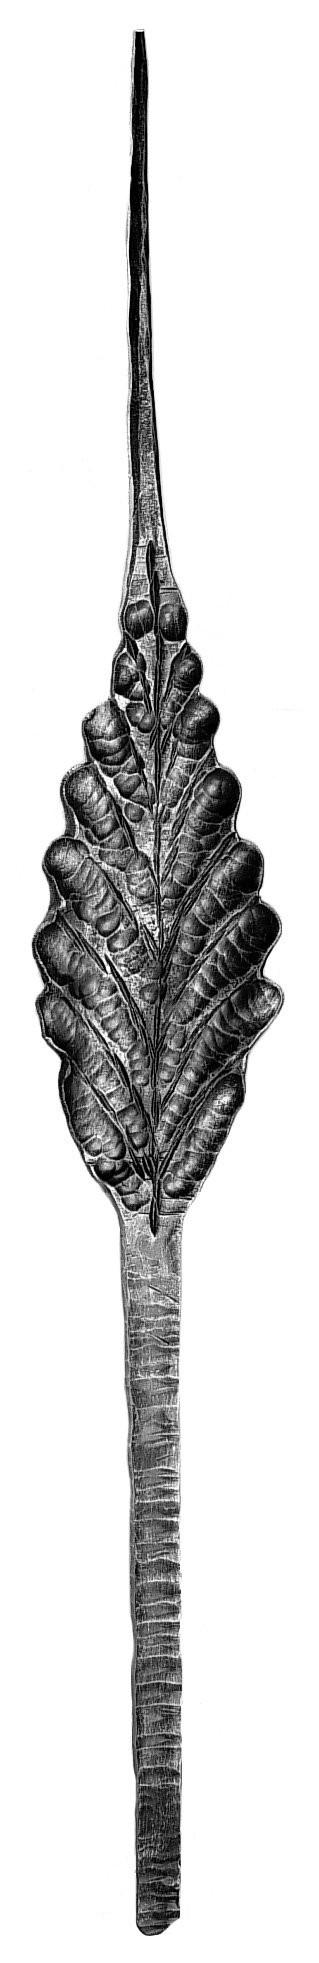 "Leaf, Flat, Large (40""H, 5-1/2""W)"